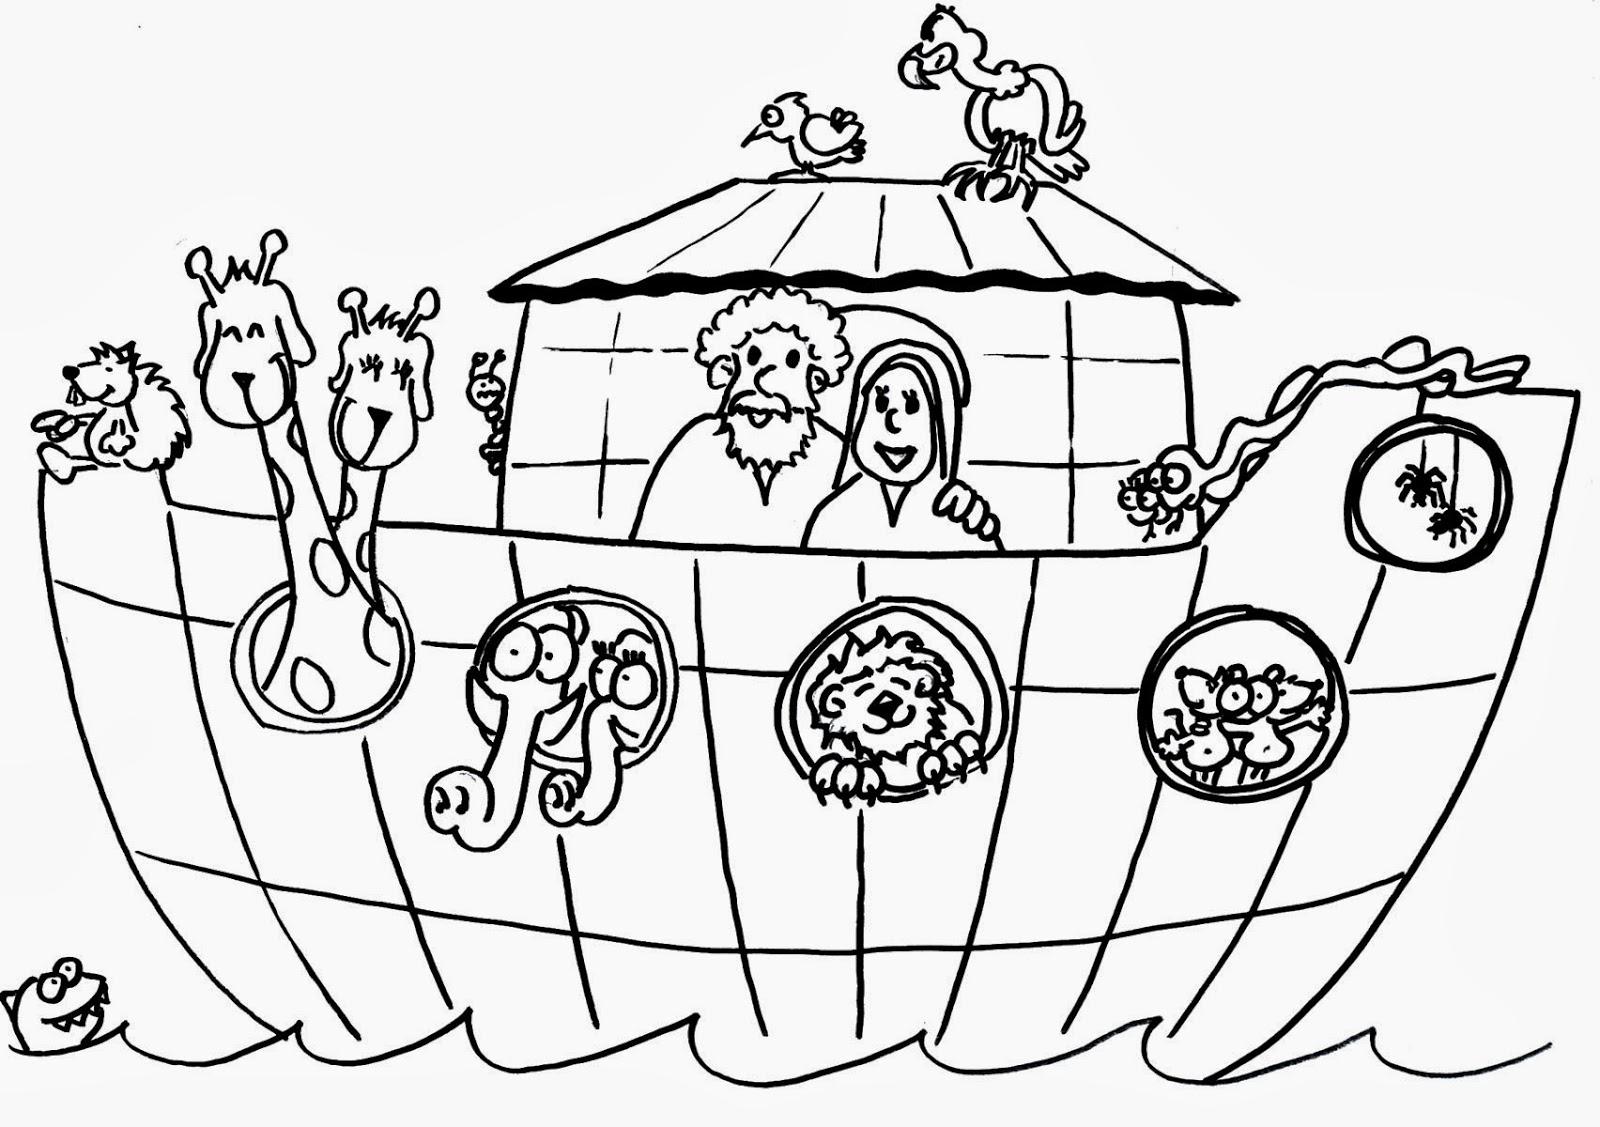 A Religion Con Dorkas Actividades 1o 2o Primaria De Relisoft